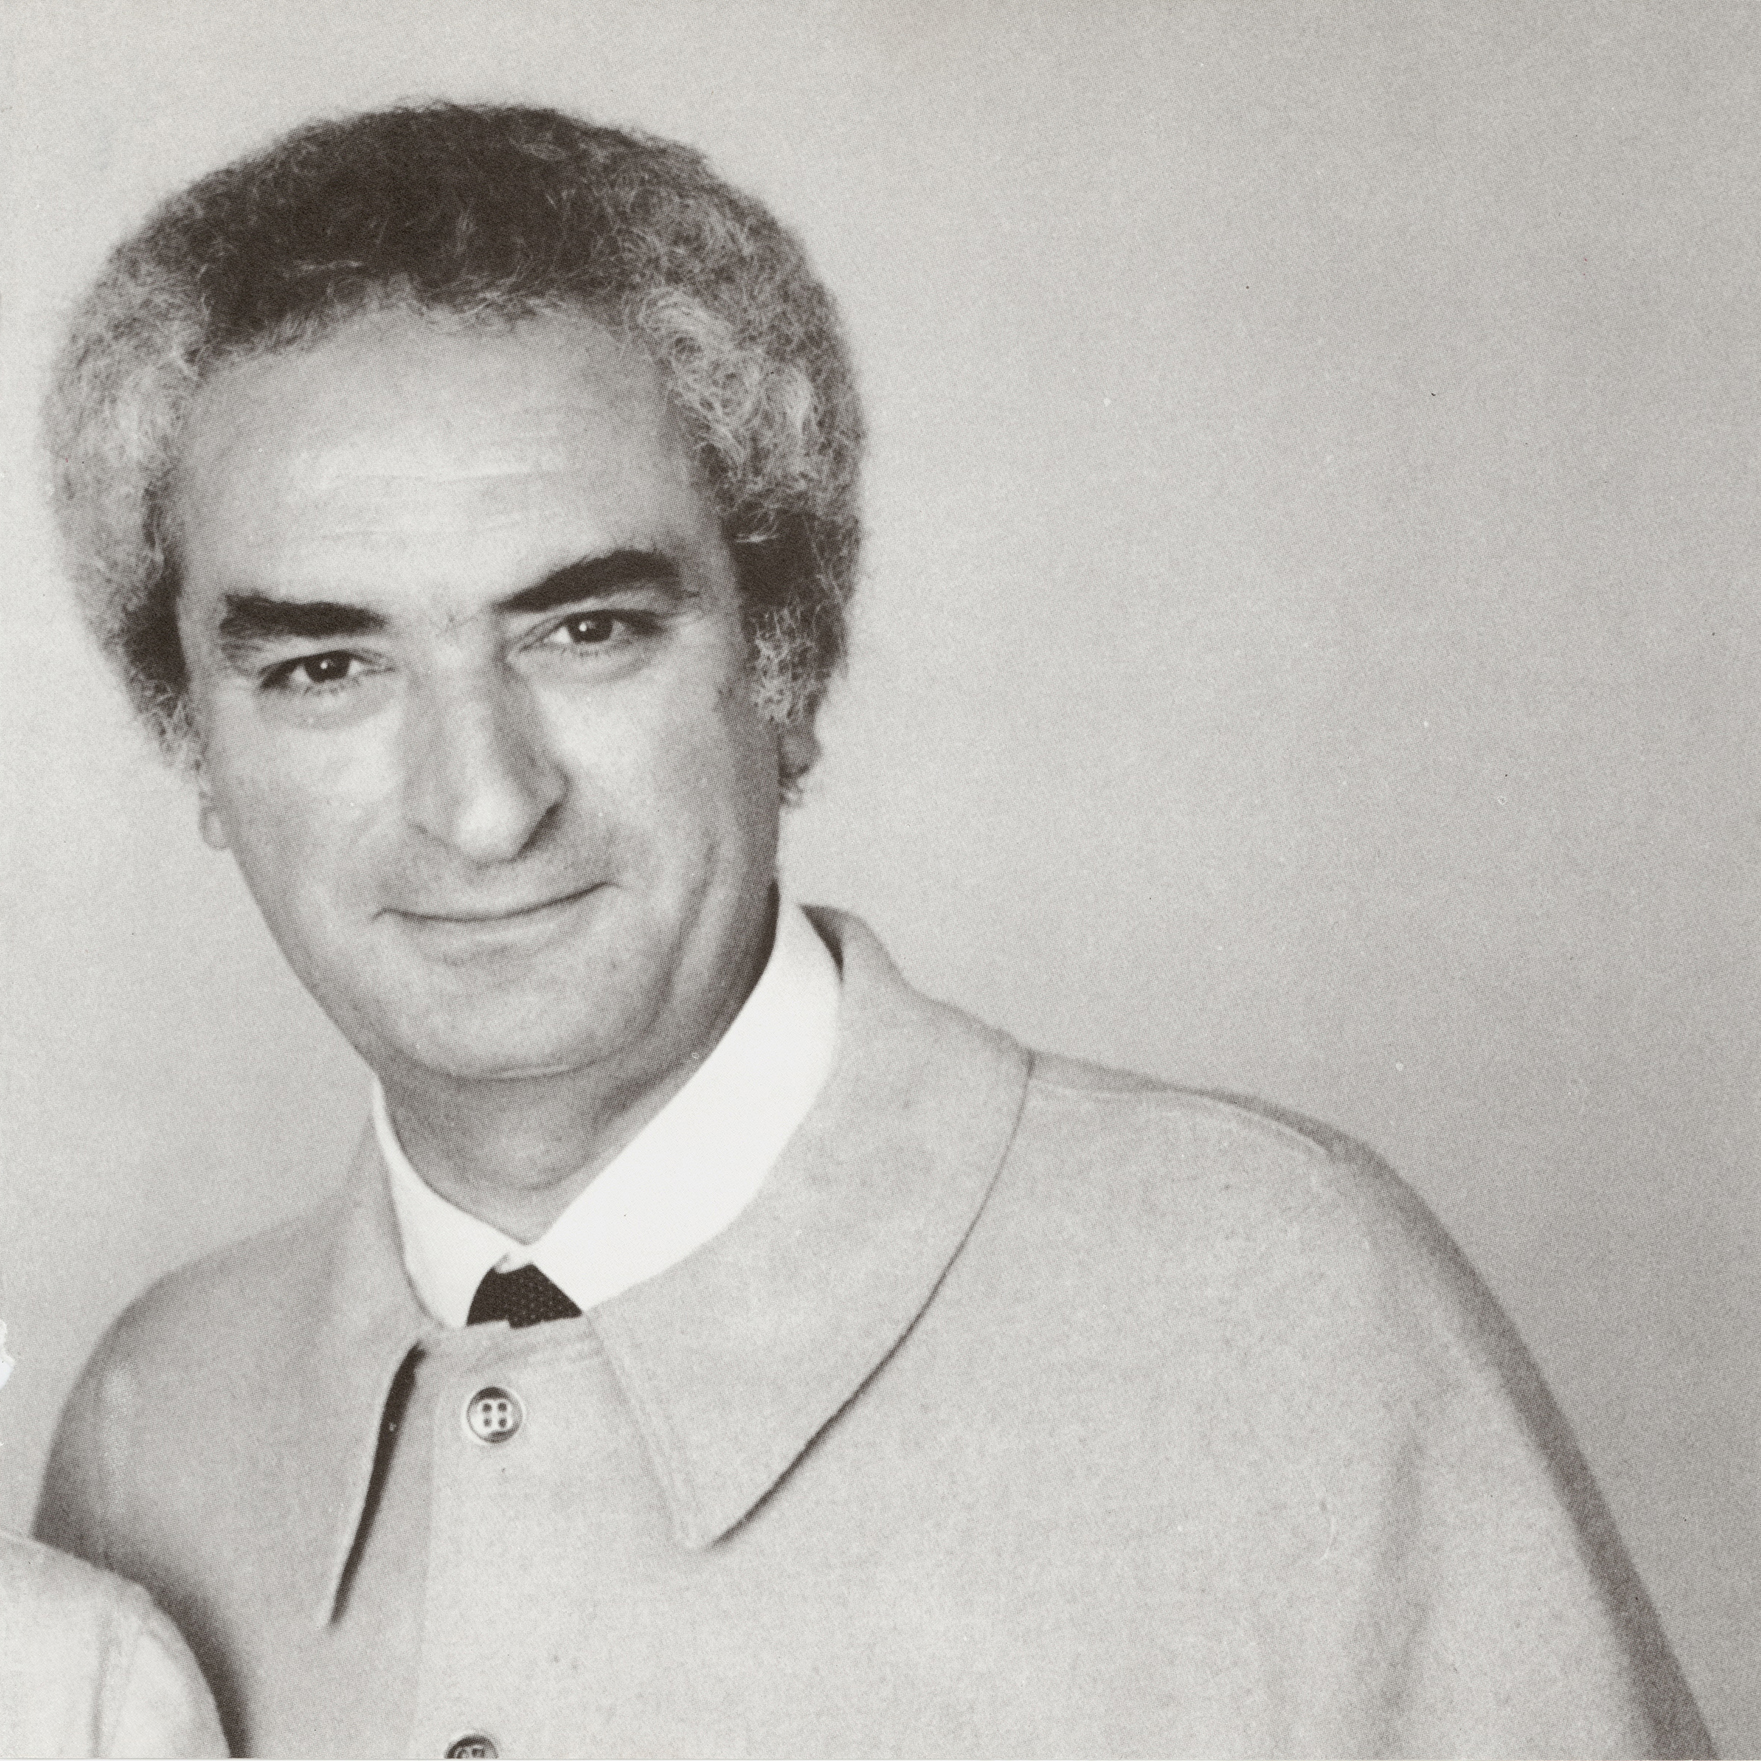 Remembering Massimo Vignelli | Inspiration | Knoll